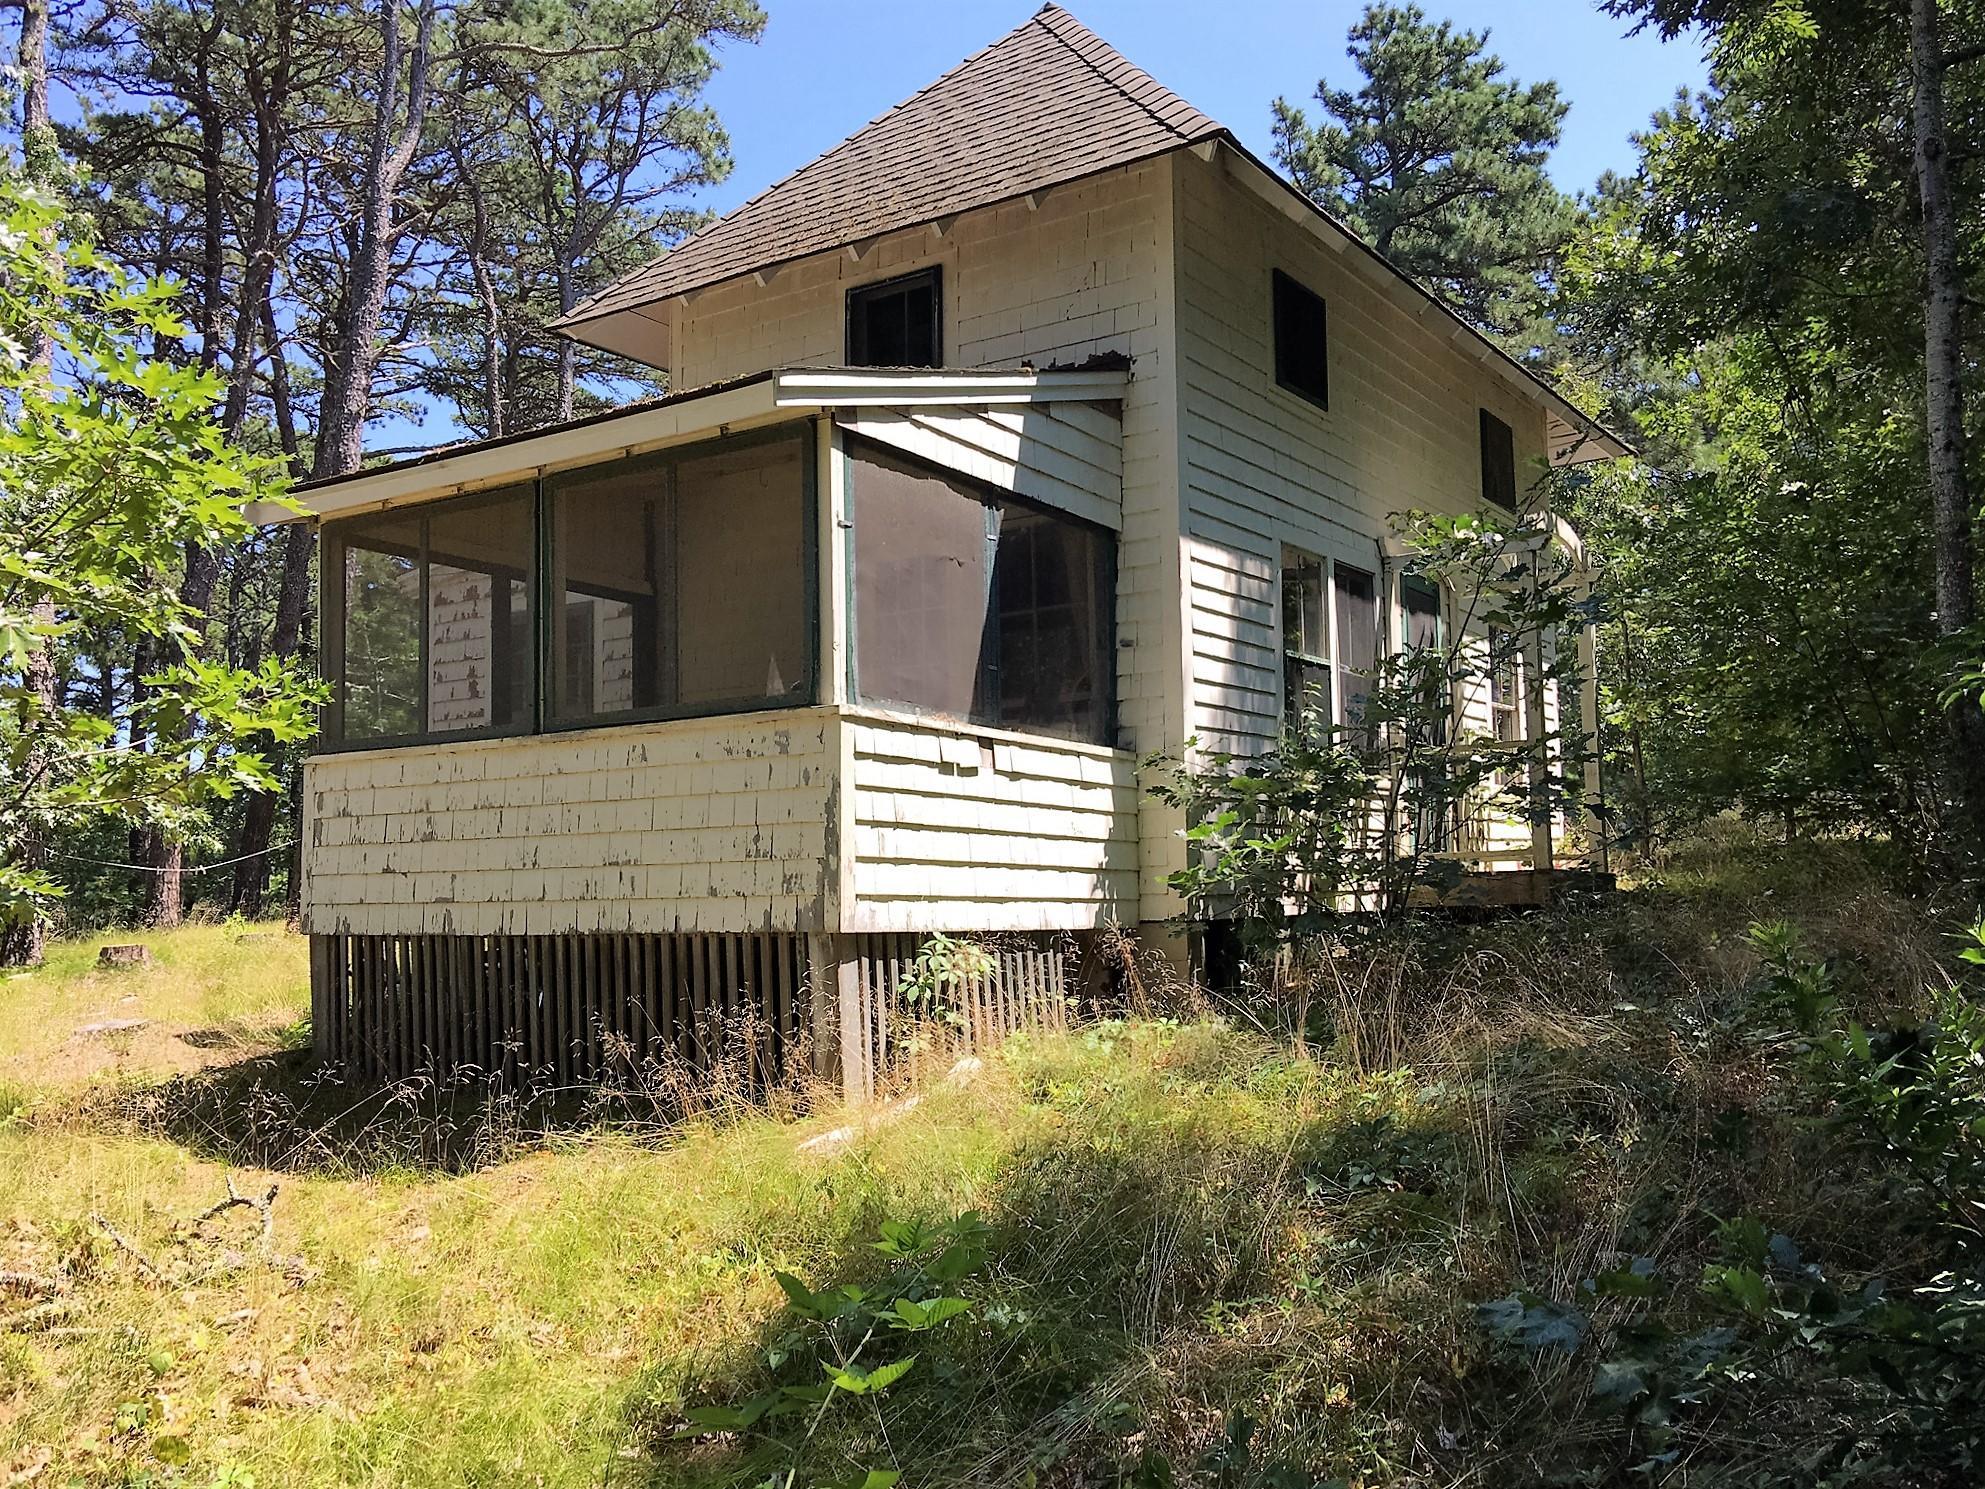 35 Mountain Avenue, Wellfleet MA, 02667 details